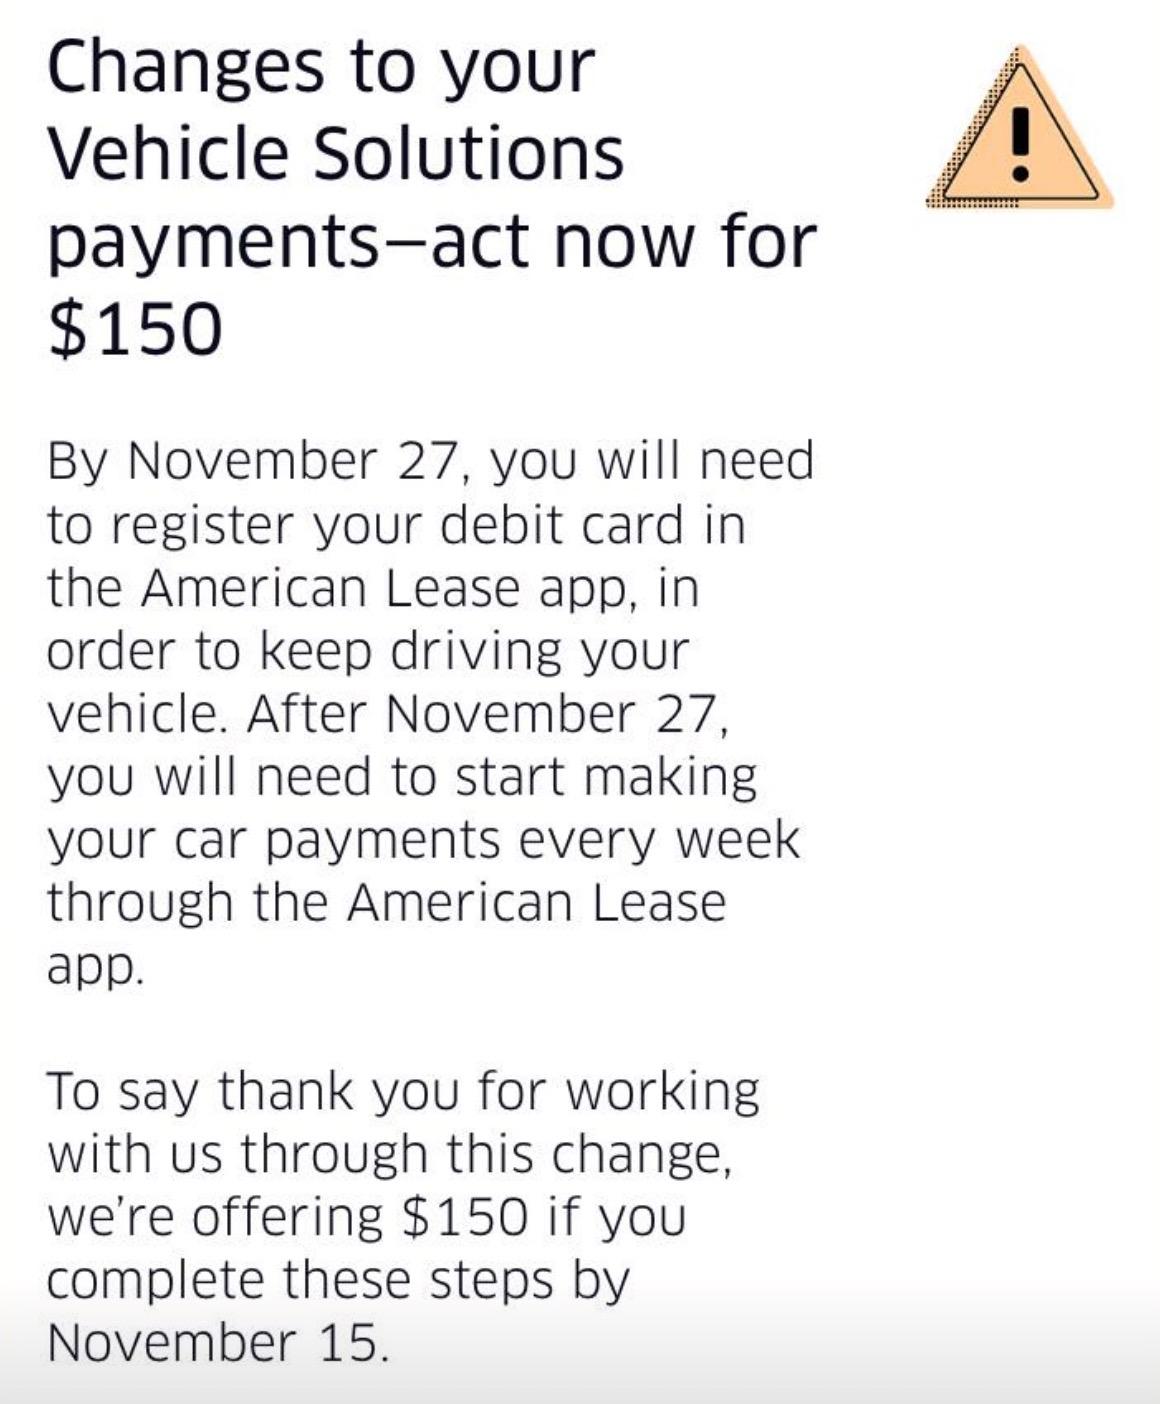 Uber Ends Subprime Car Leasing Program For New York Drivers Quartz